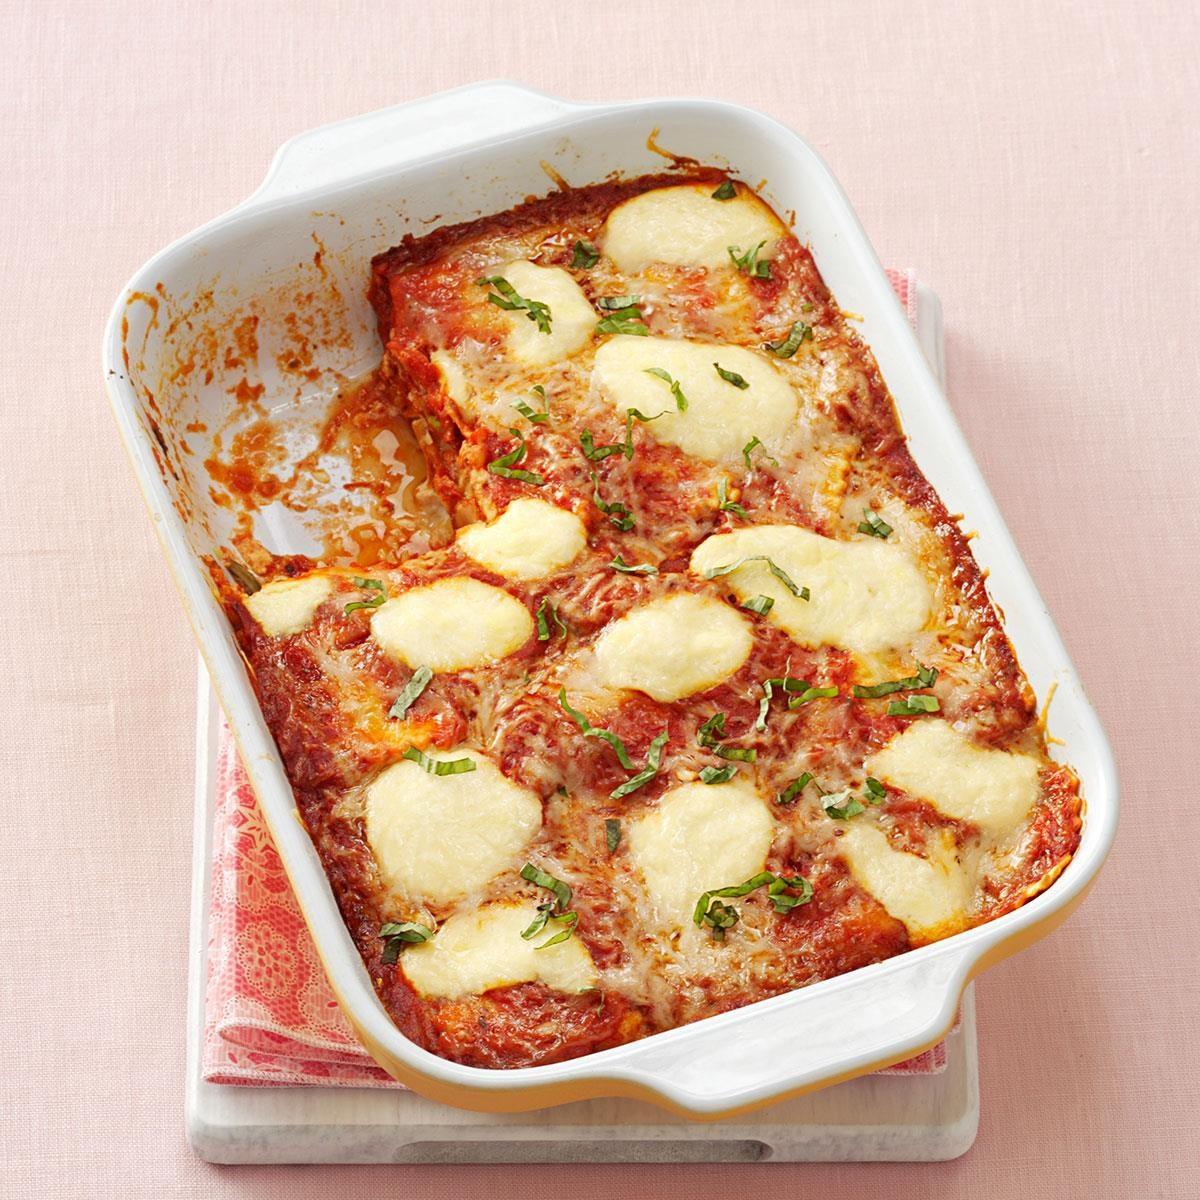 ravioli recipes taste of home lobster house